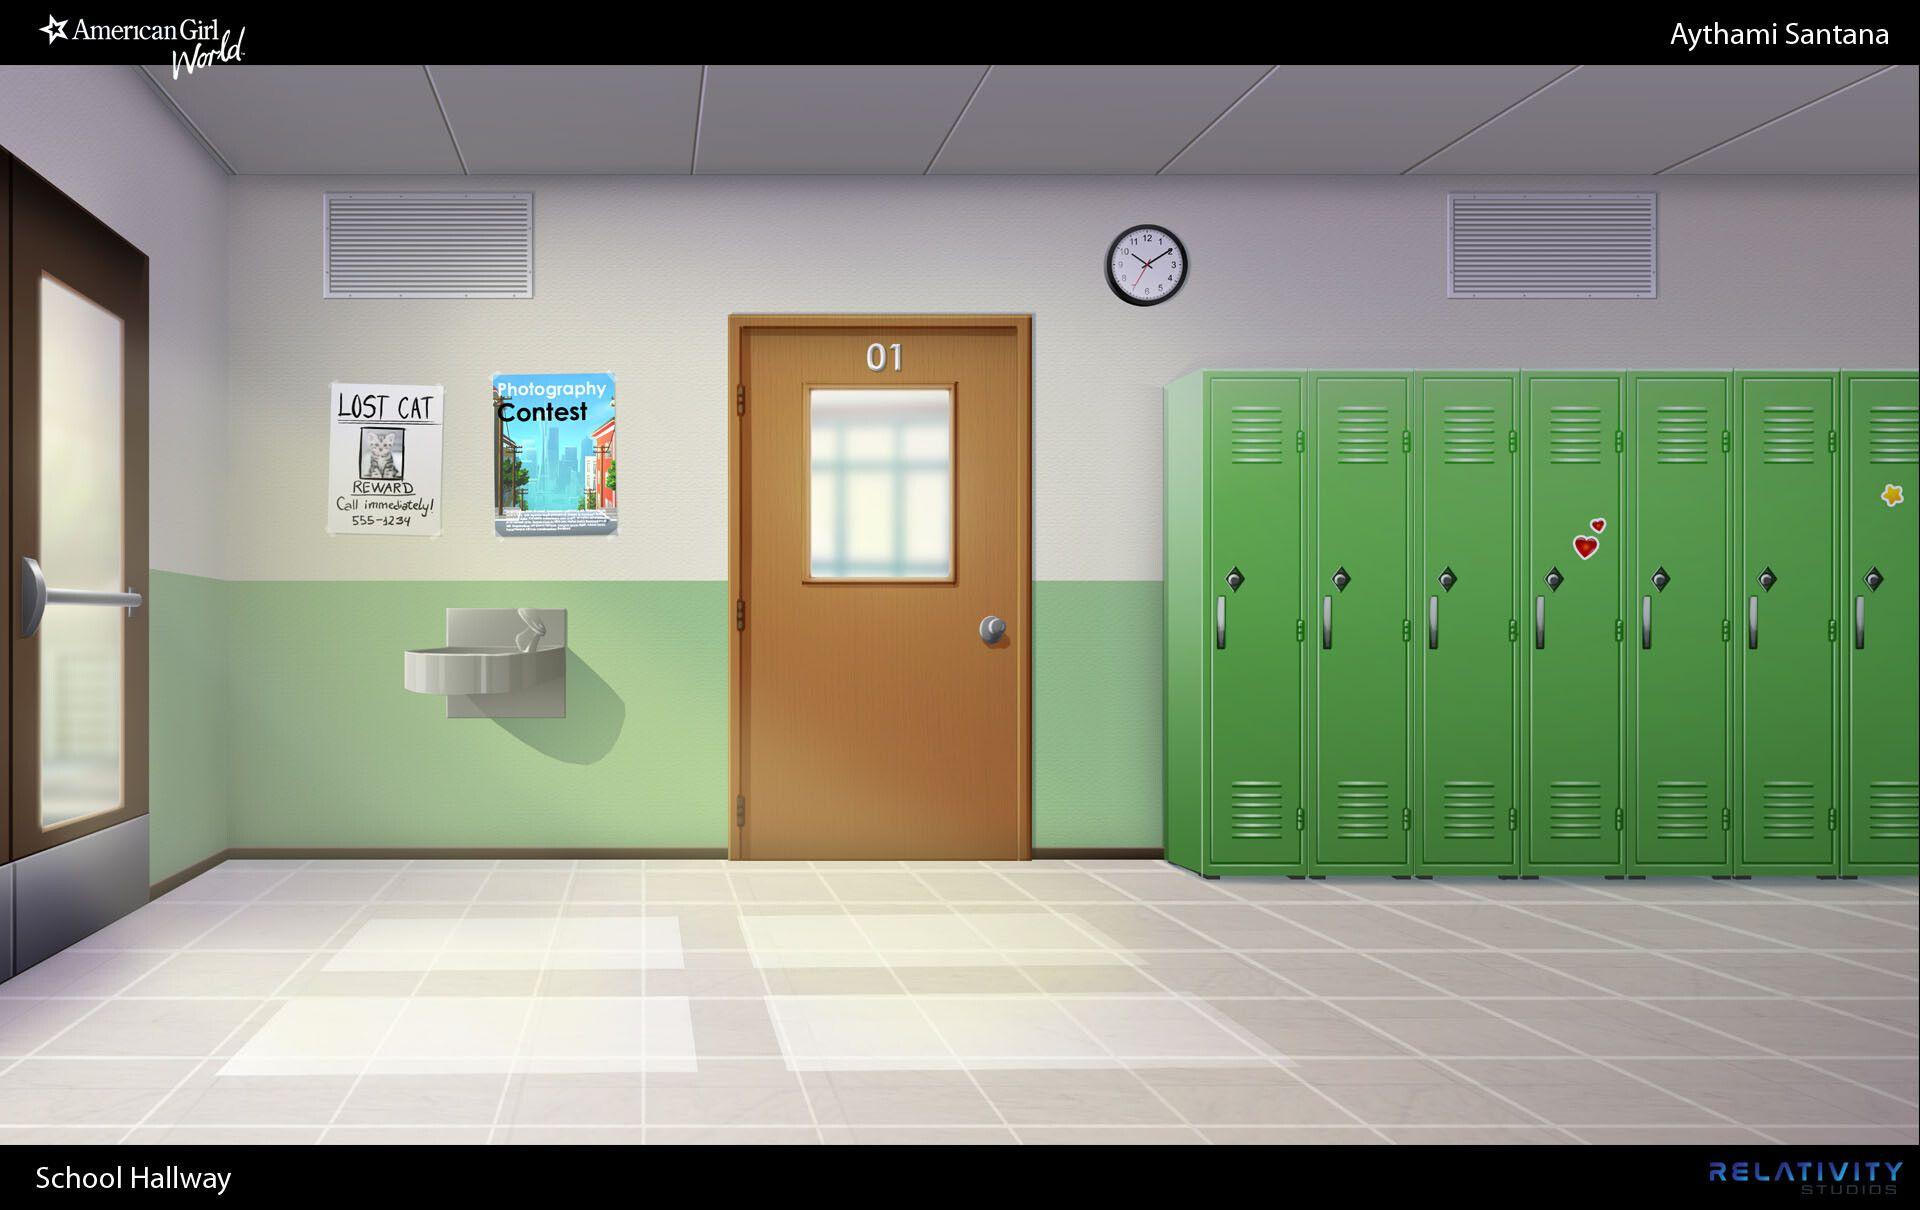 ArtStation American Girl World School Hallway, Aythami